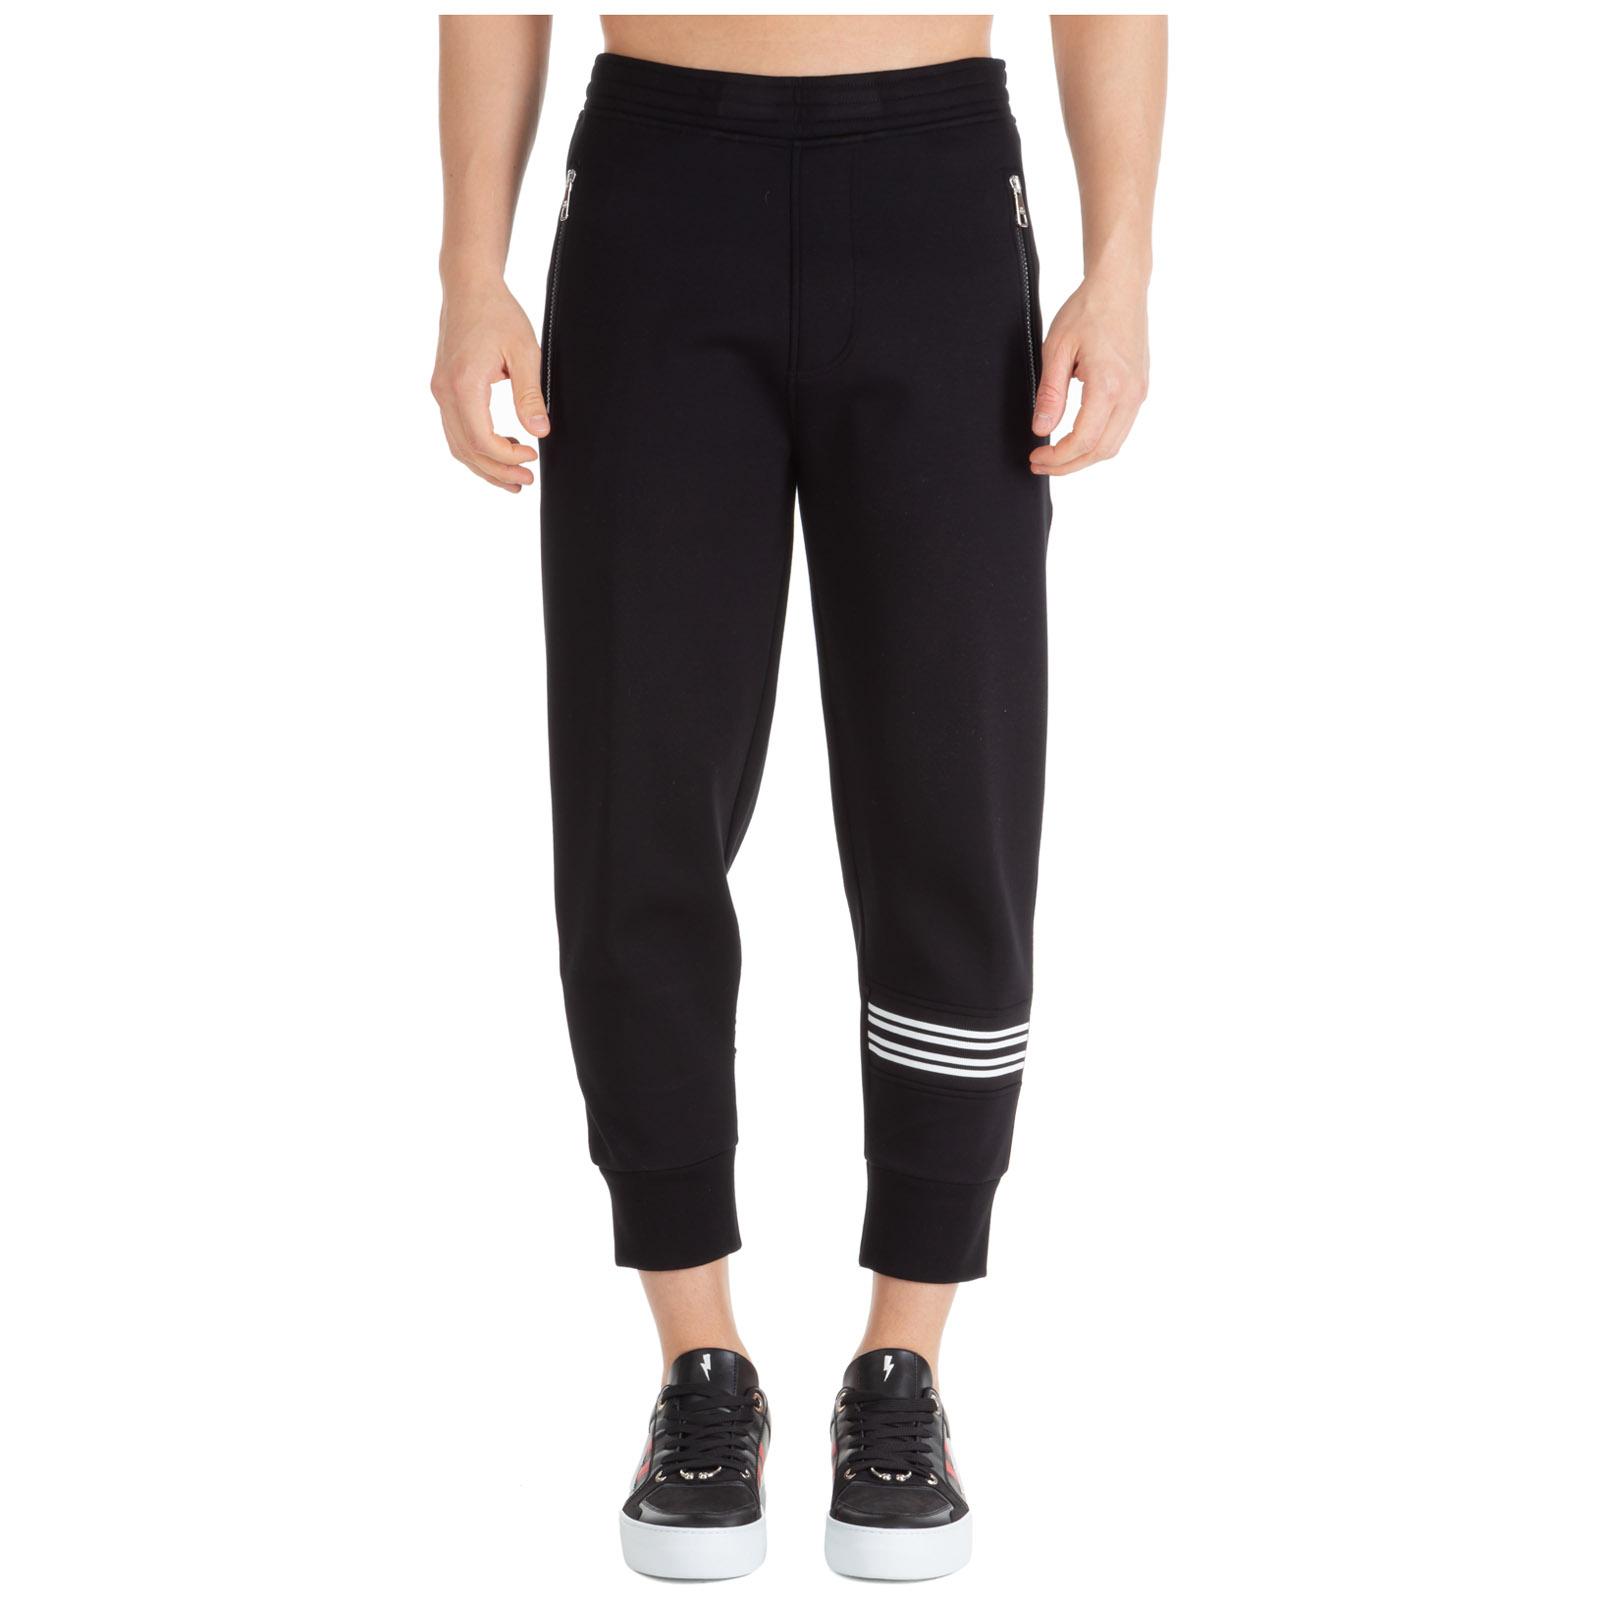 Neil Barrett Men's sport tracksuit trousers irregular stripe bonded  - Black - Size: Extra Large